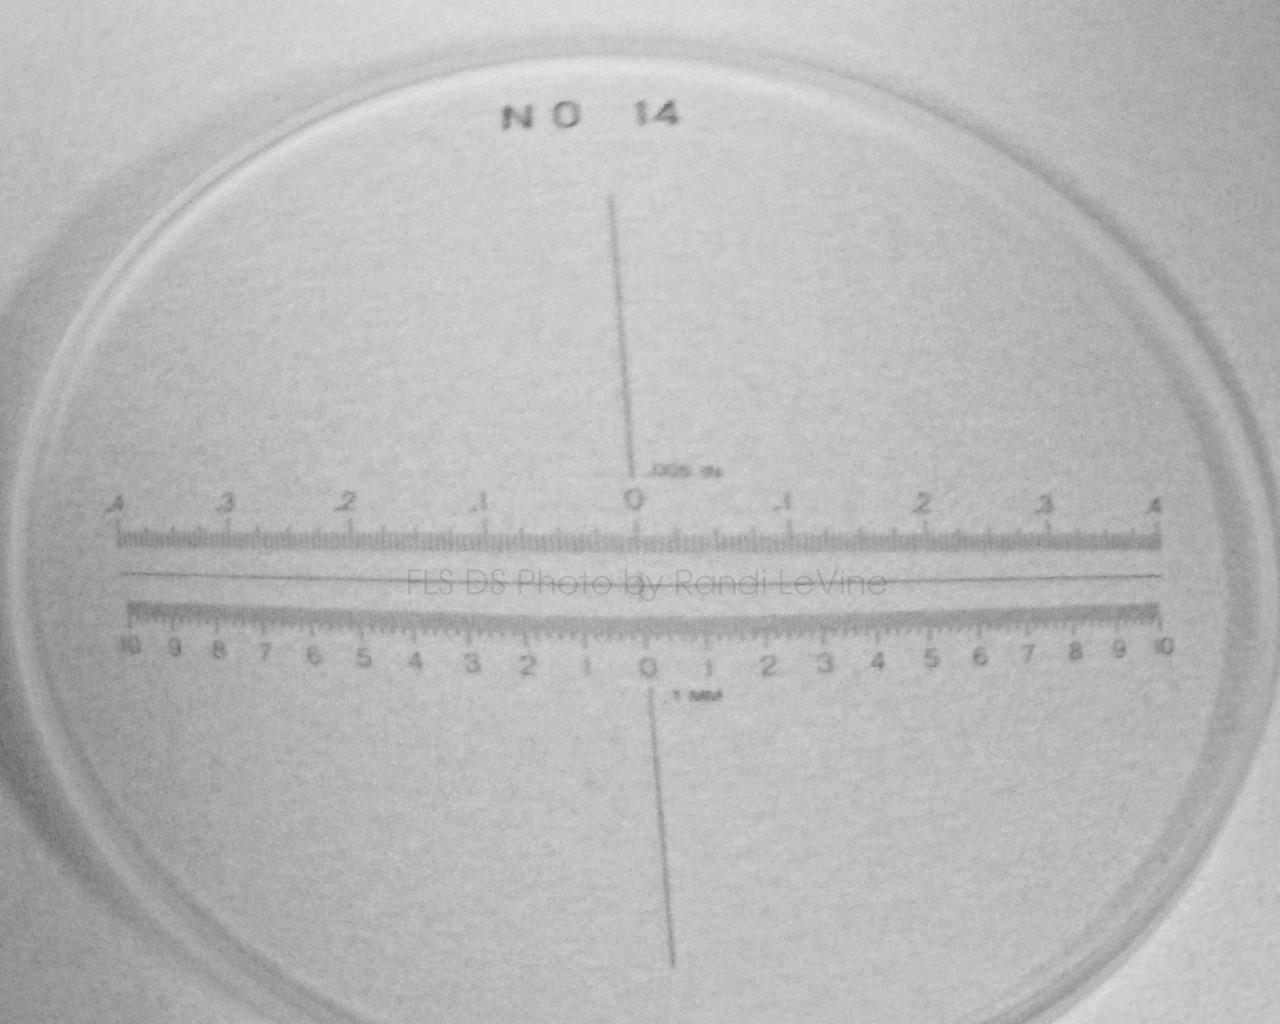 #14 Scale, Peak Scale Loupe Measuring Magnifier 7X 1975 , pk-1975-14